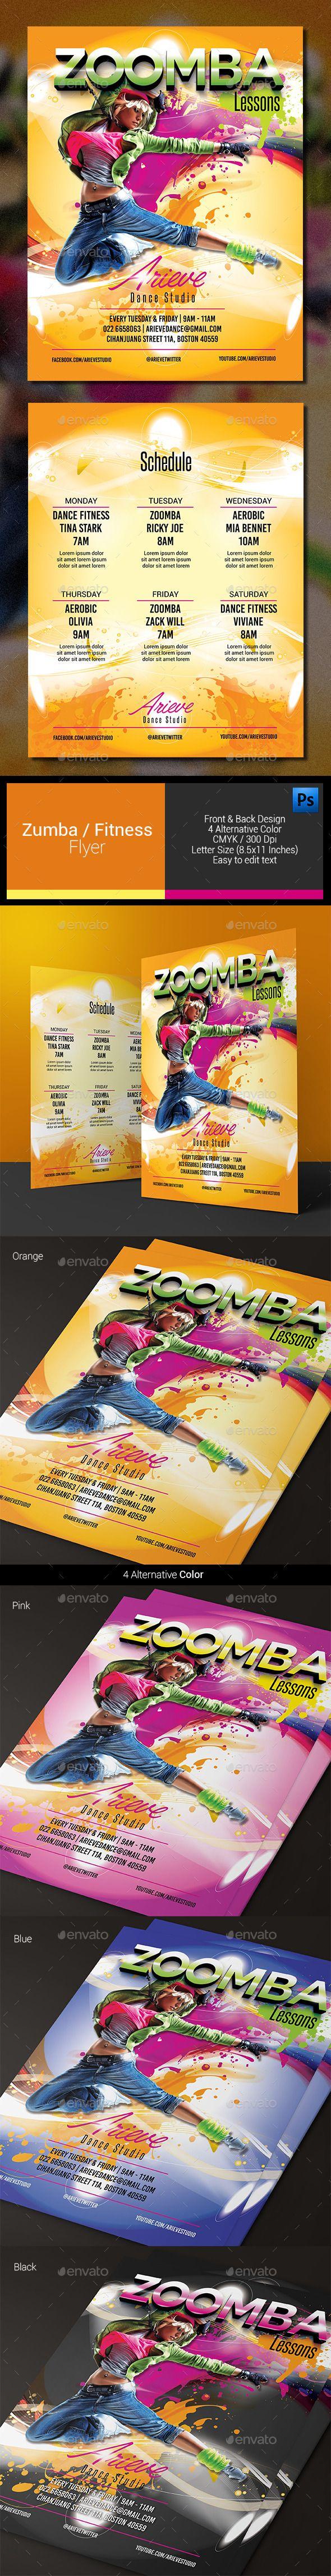 Zumba flyer design zumba flyers - Zumba Fitness Flyer